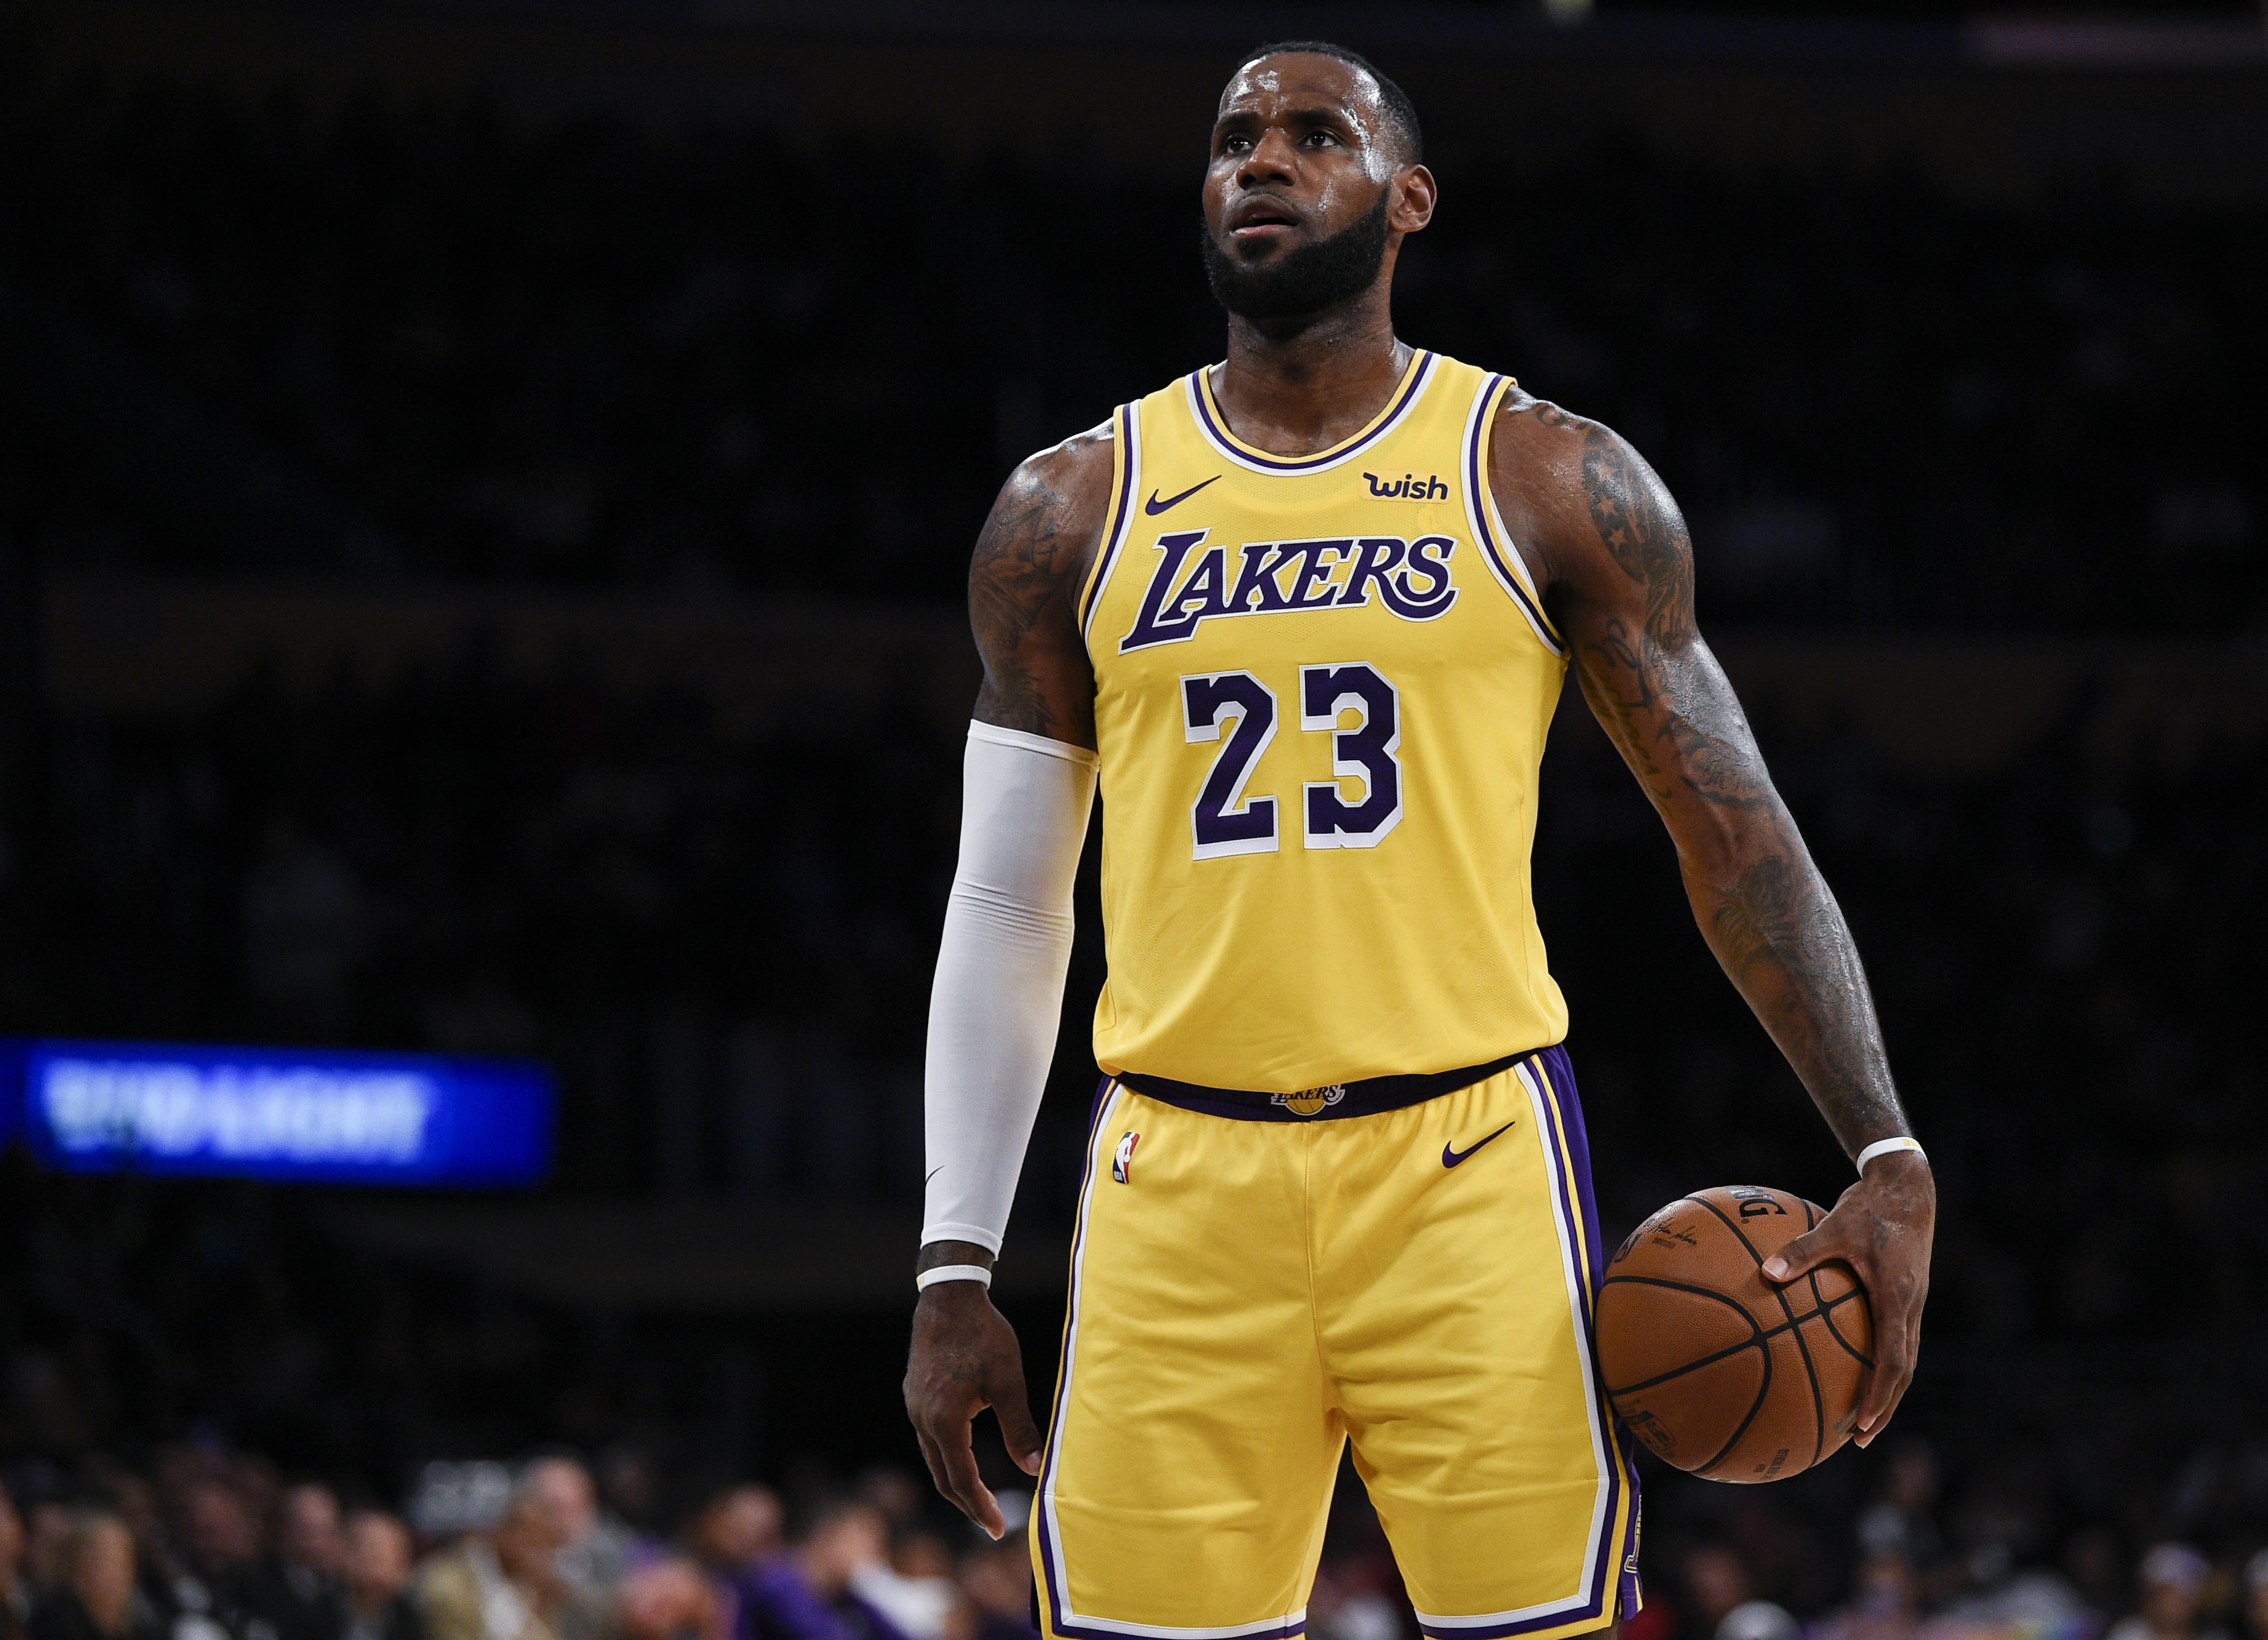 Nba Wallpapers Lebron James Lakers